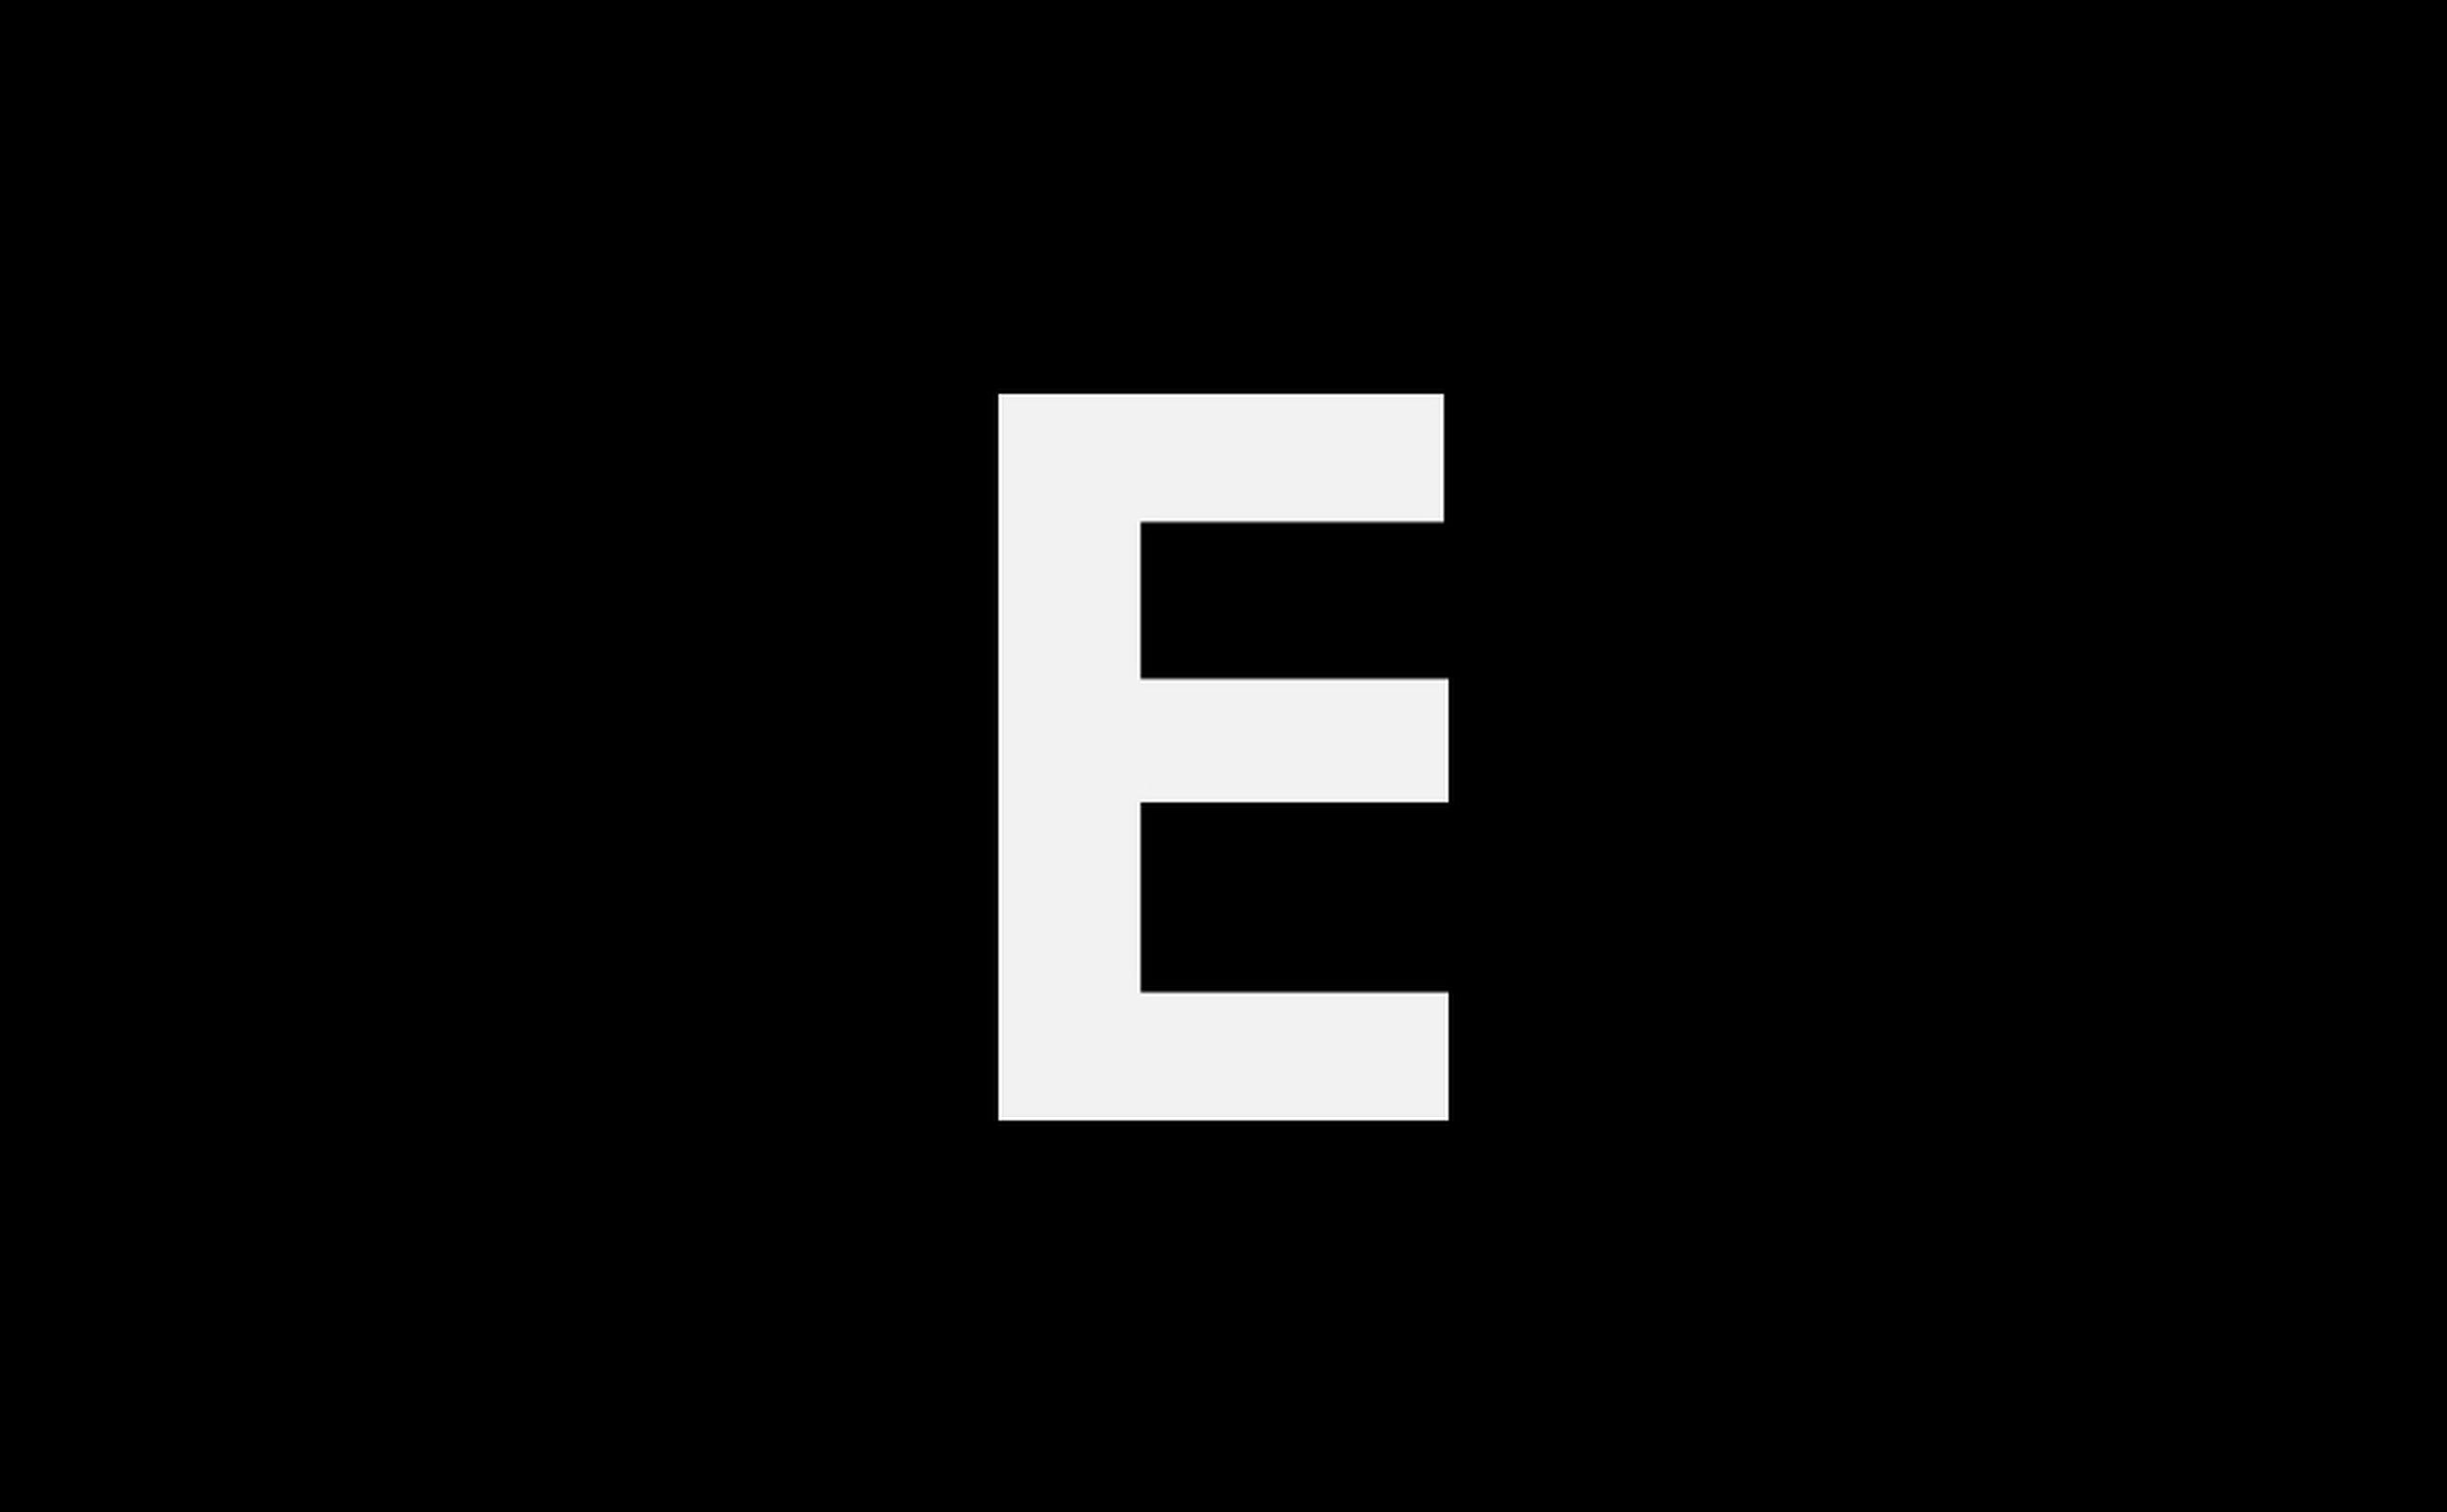 CLOSE-UP OF YELLOW CROCUS FLOWER